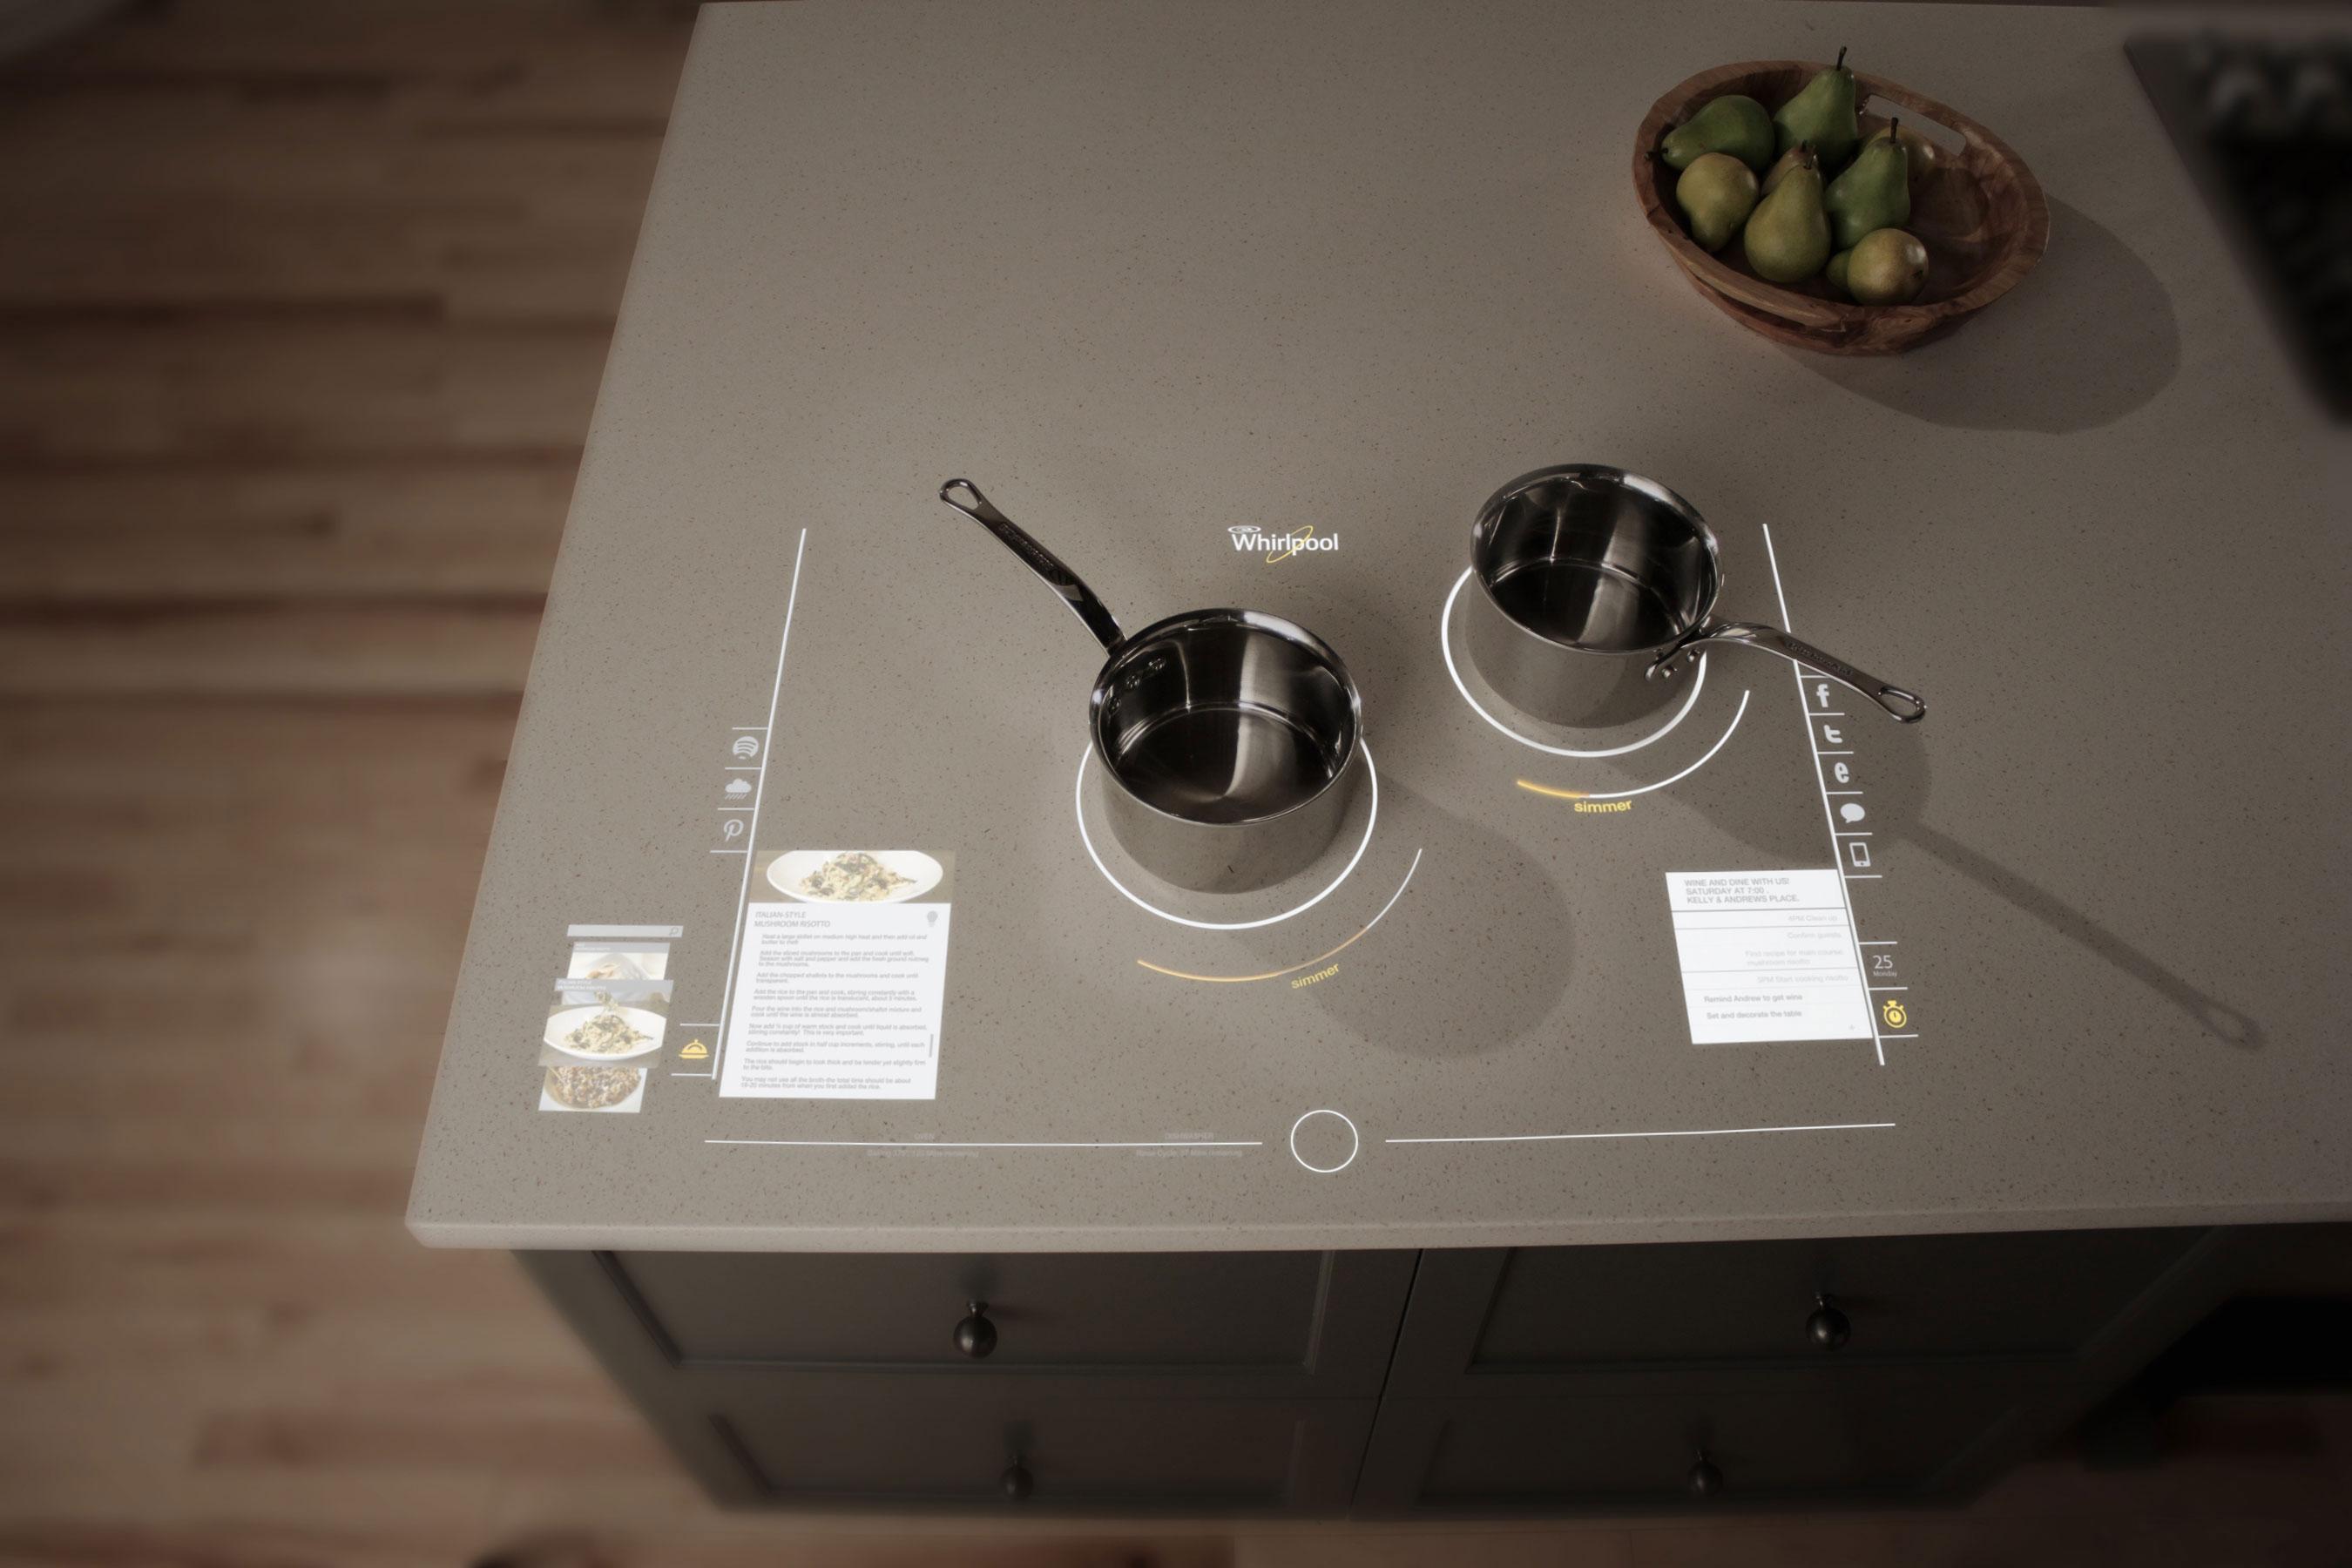 Whirpool Pamerkan Teknologi Dapur Masa Depan